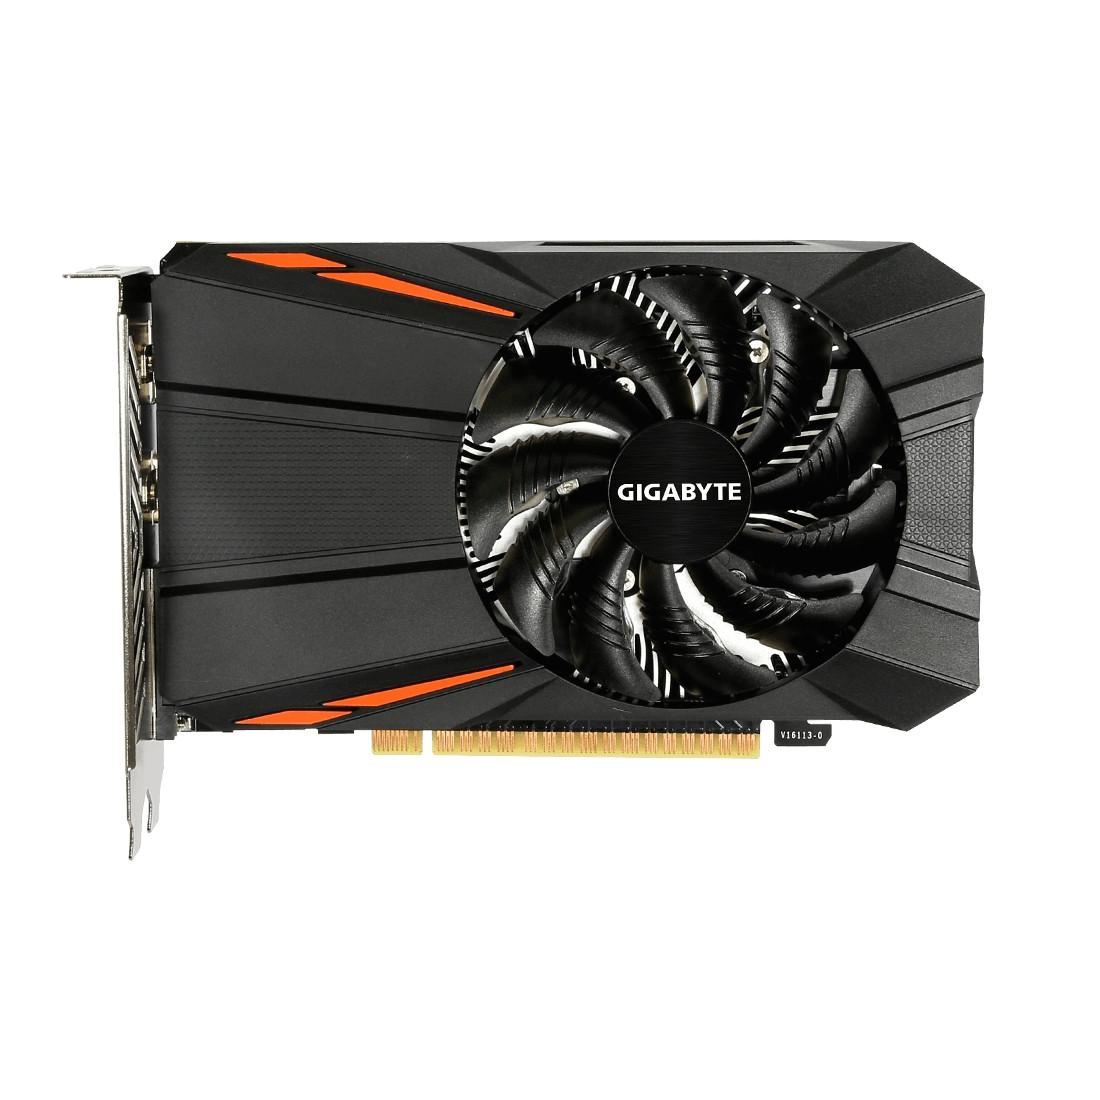 Видеокарта Gigabyte GeForce GTX1050TI 4GB DDR5 (GV-N105TD5-4GD)